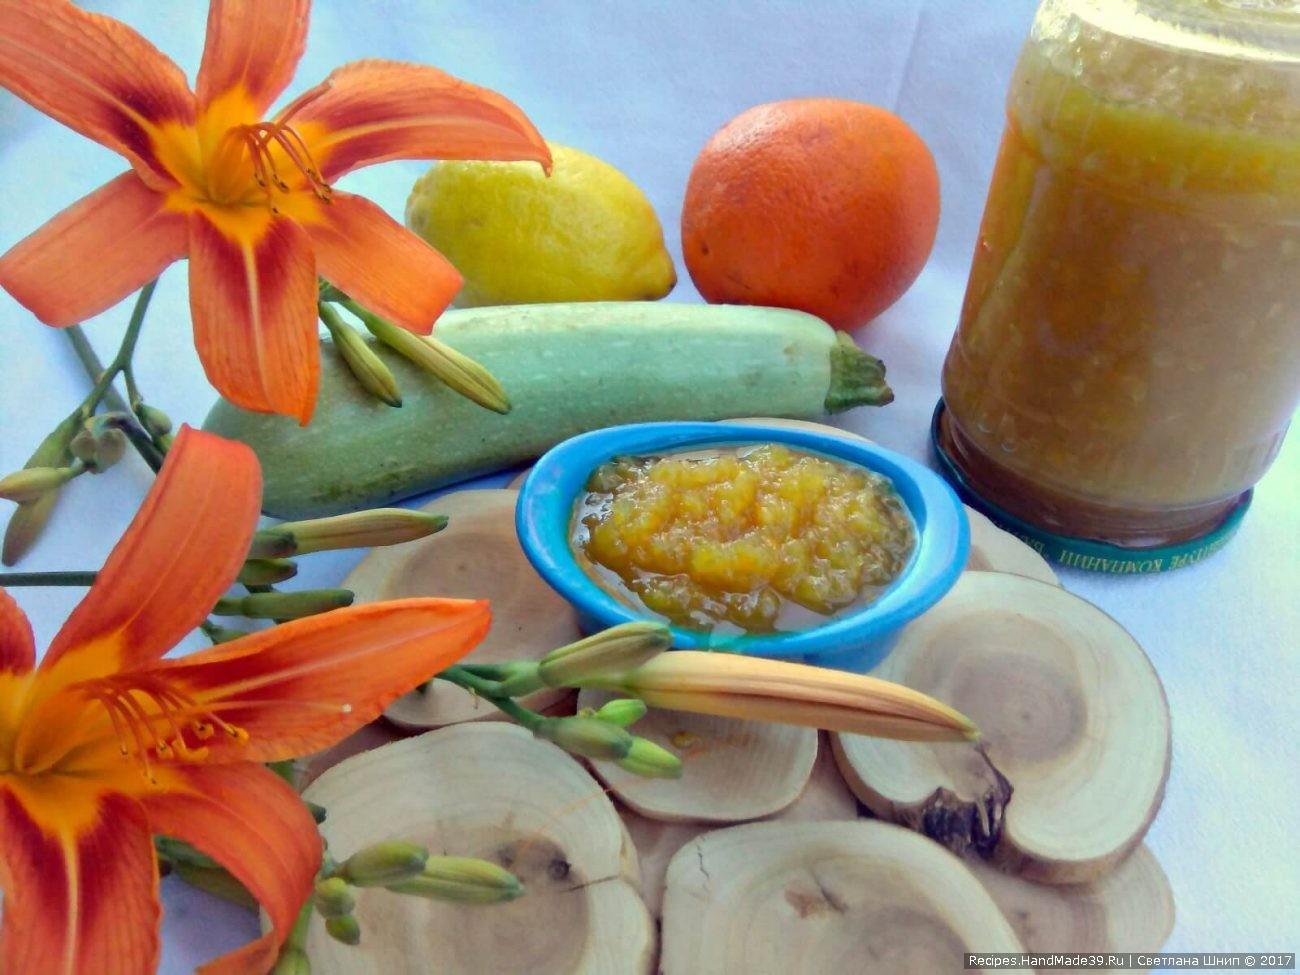 Кабачковое варенье с лимоном и апельсином